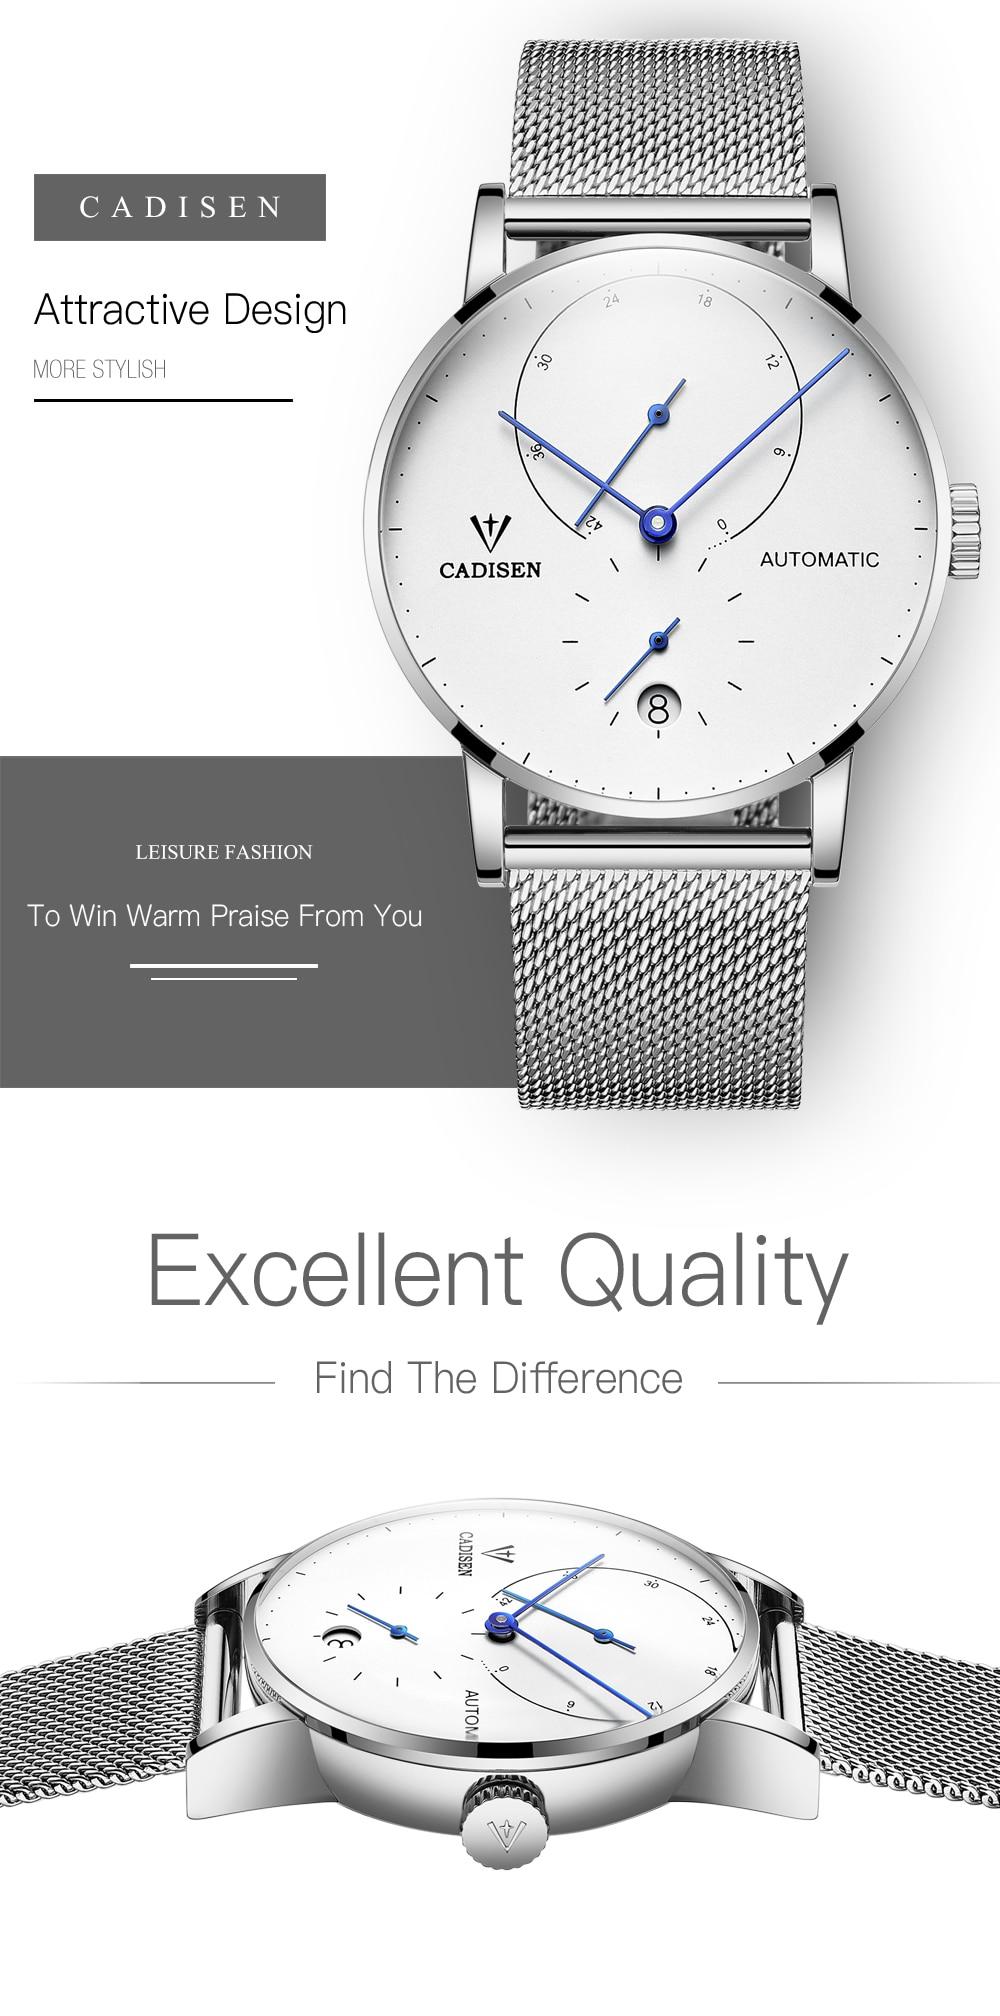 HTB1IrYMDeuSBuNjSsplq6ze8pXaX Mens Watches CADISEN 2019 Top Luxury Brand Automatic Mechanical Watch Men Full Steel Business Waterproof Fashion Sport Watches